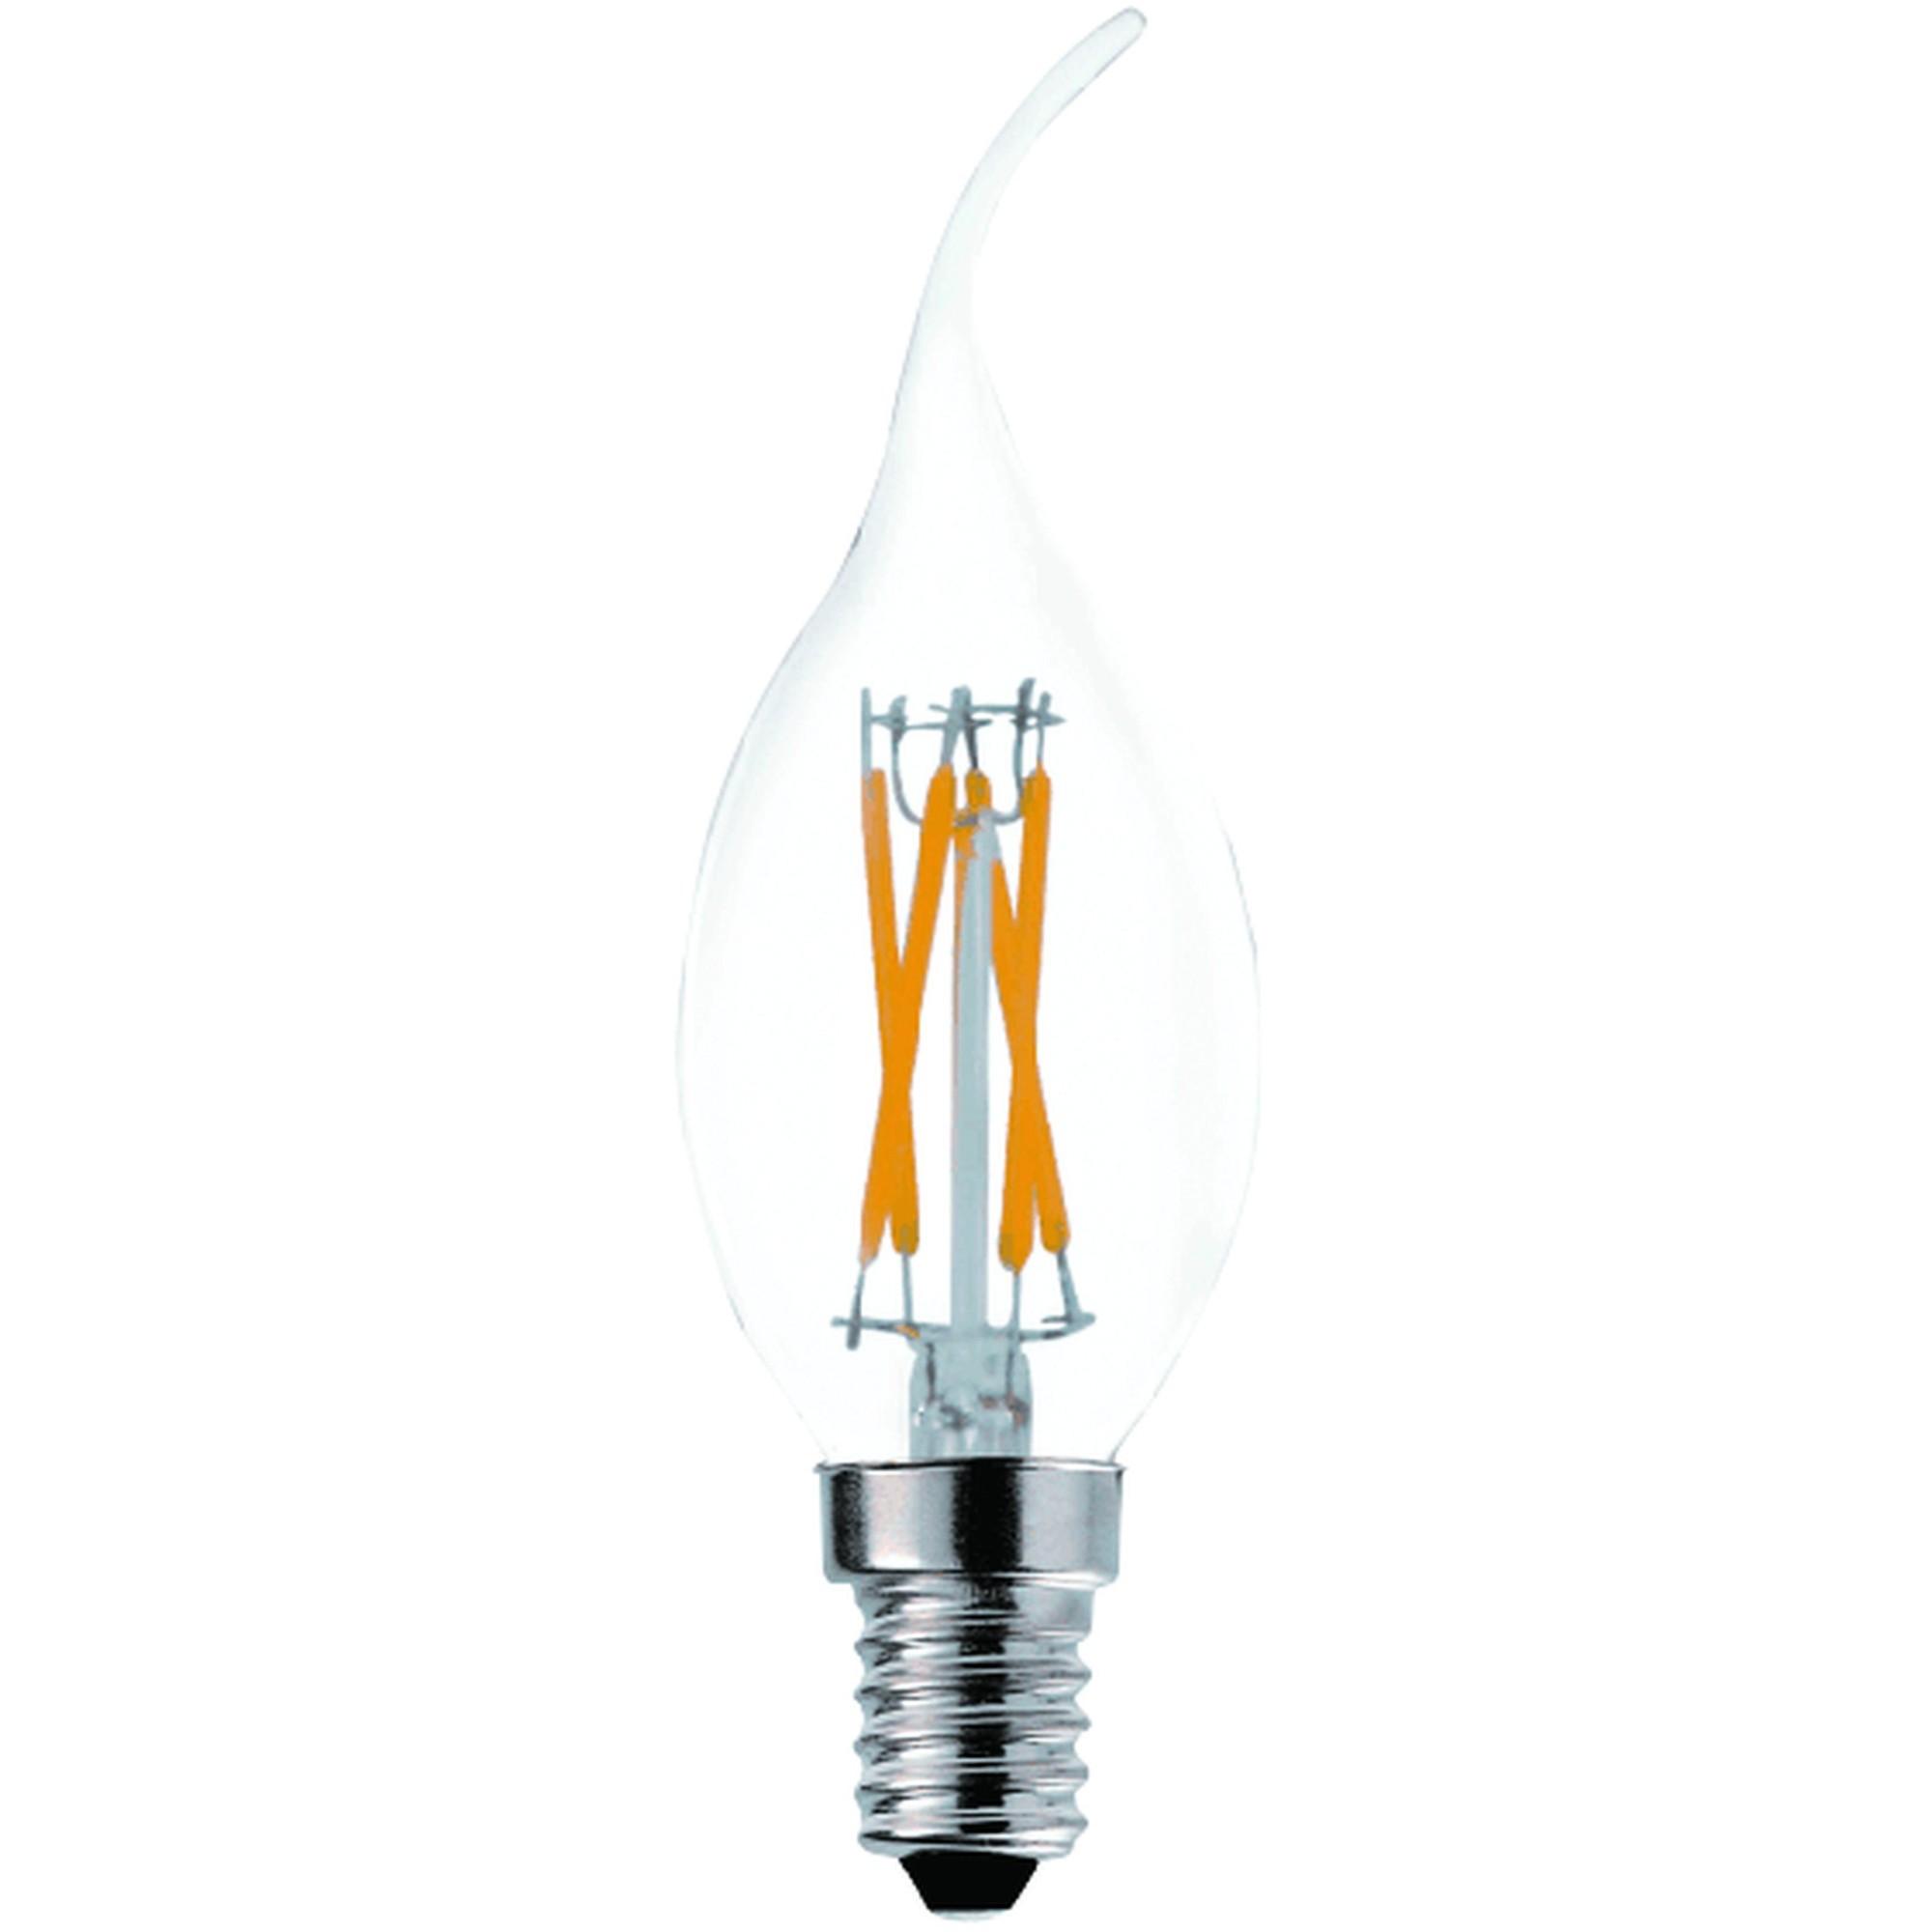 Лампа Ecola Premium светодионая E14 5 Вт свеча на ветру 500 Лм теплый свет